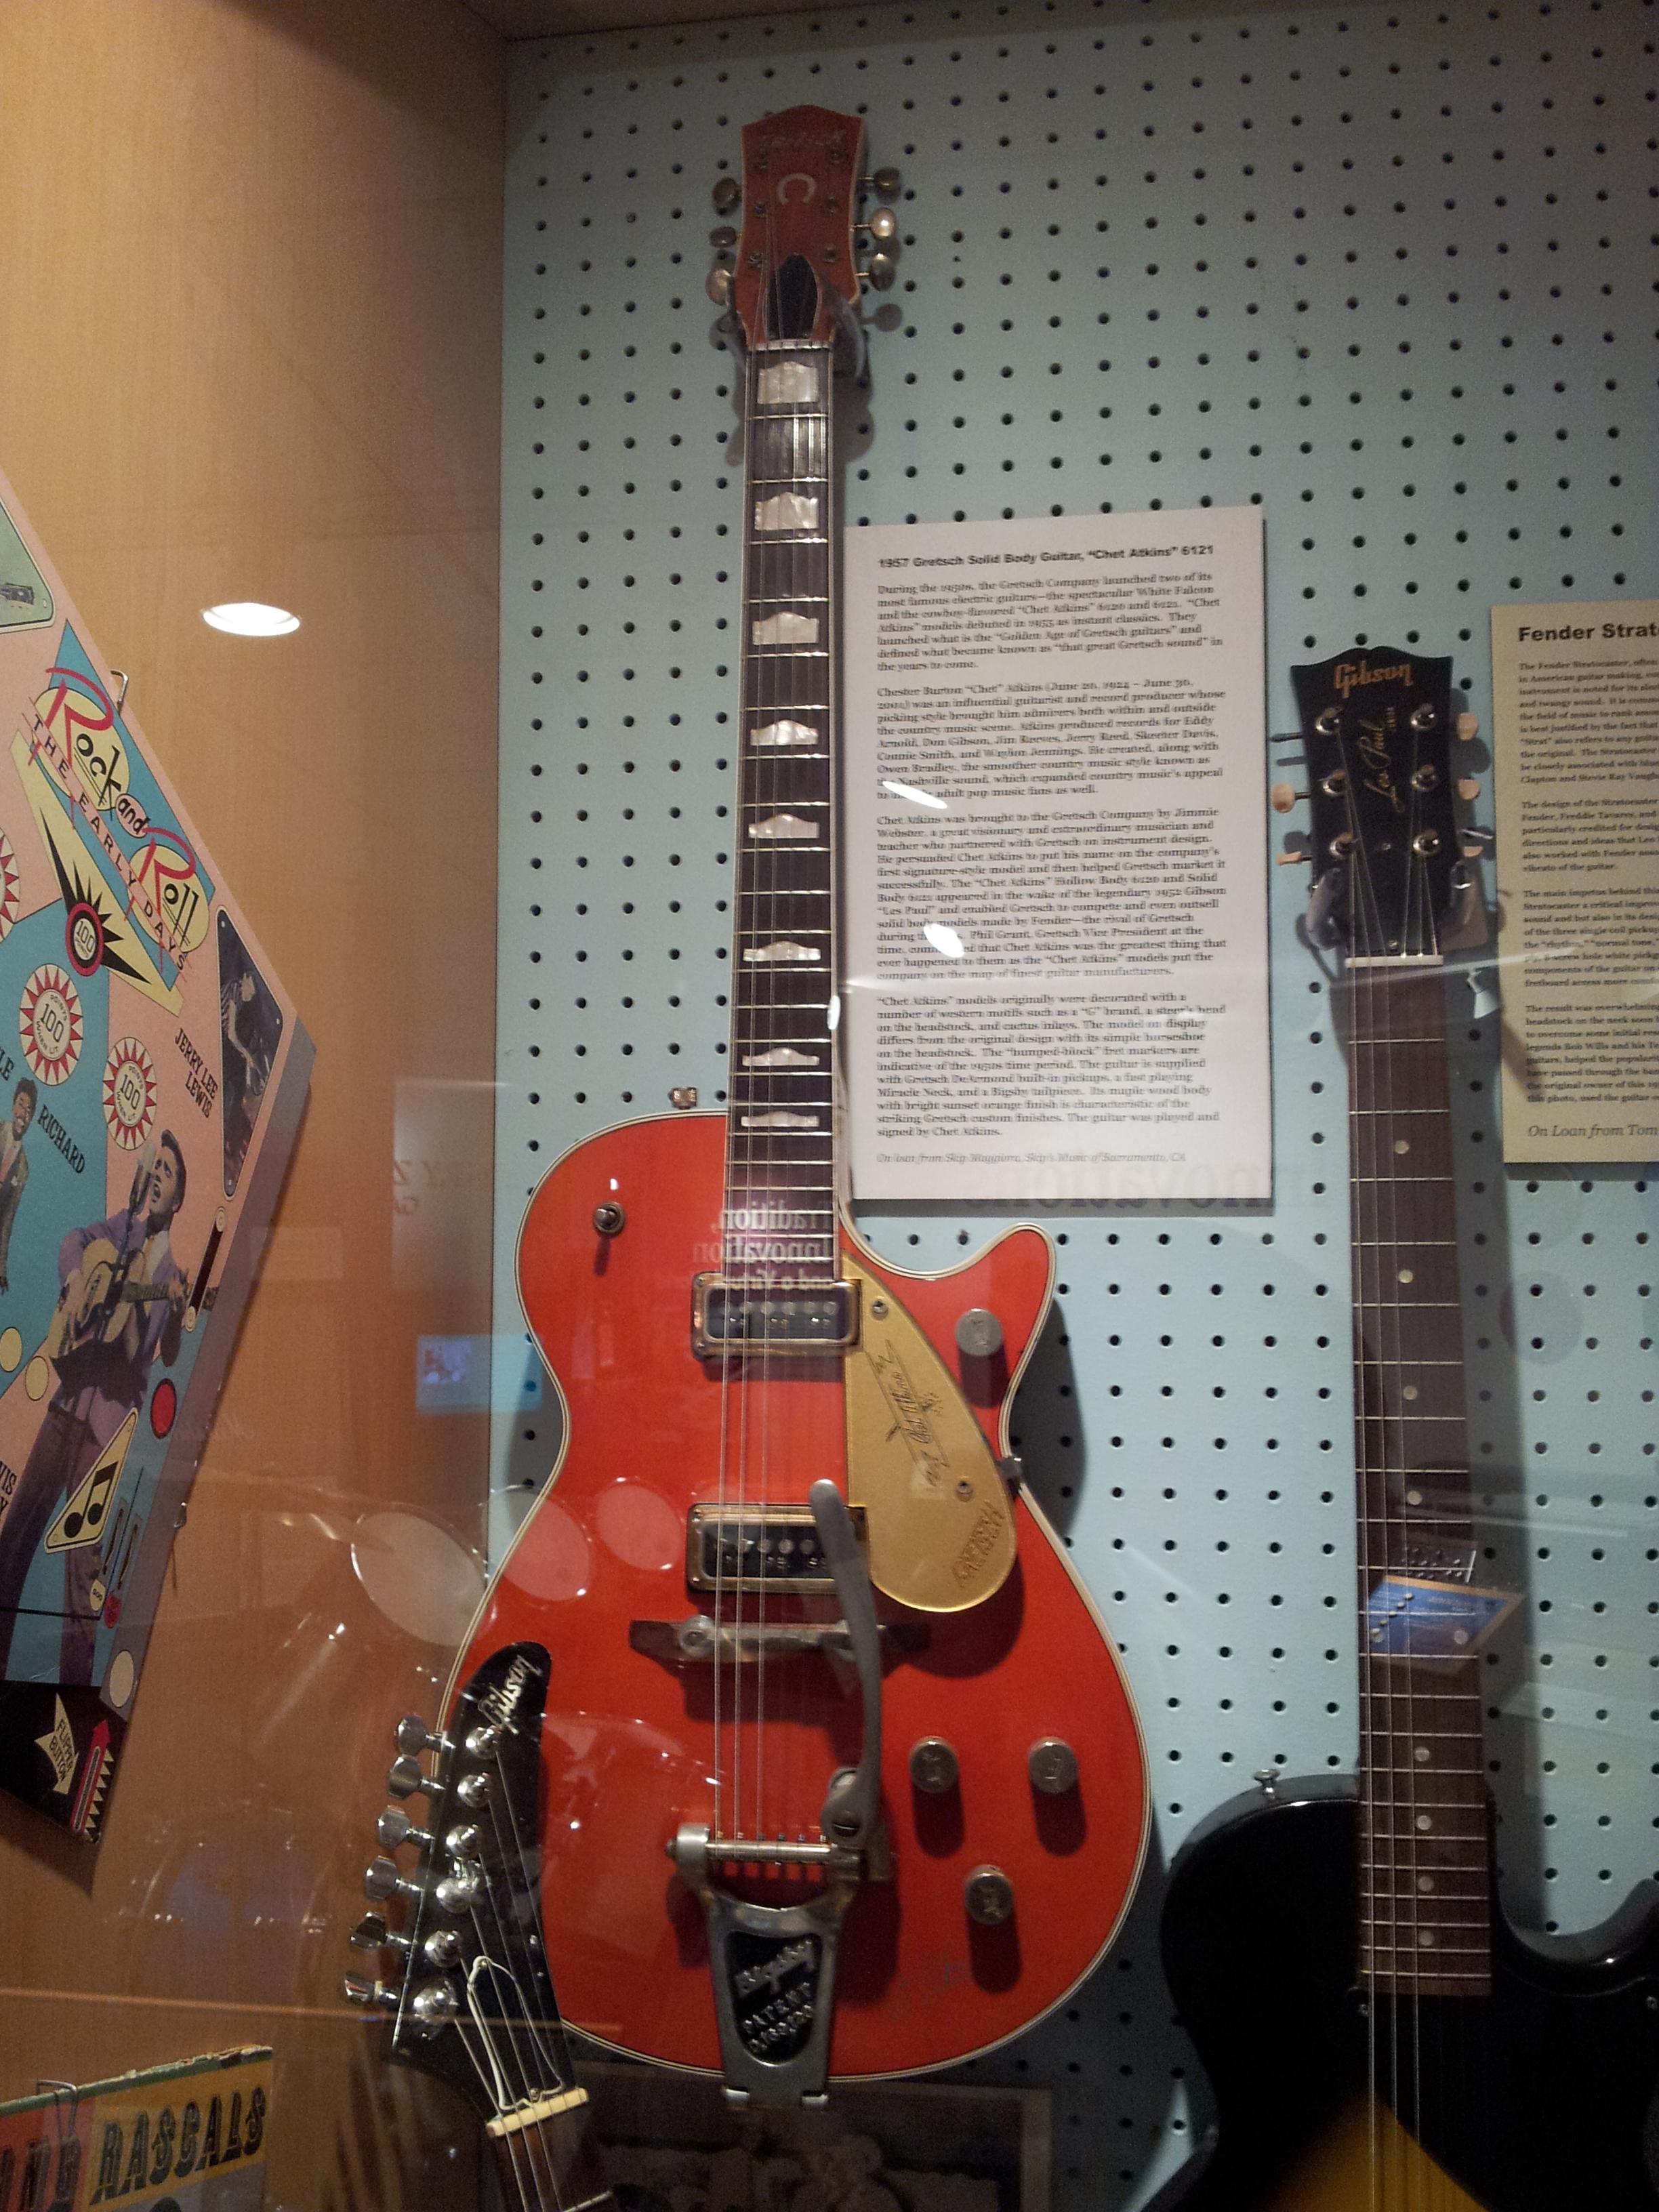 1955 Roundup Gretsch_Chet_Atkins_6121_(1957),_Museum_of_Making_Music